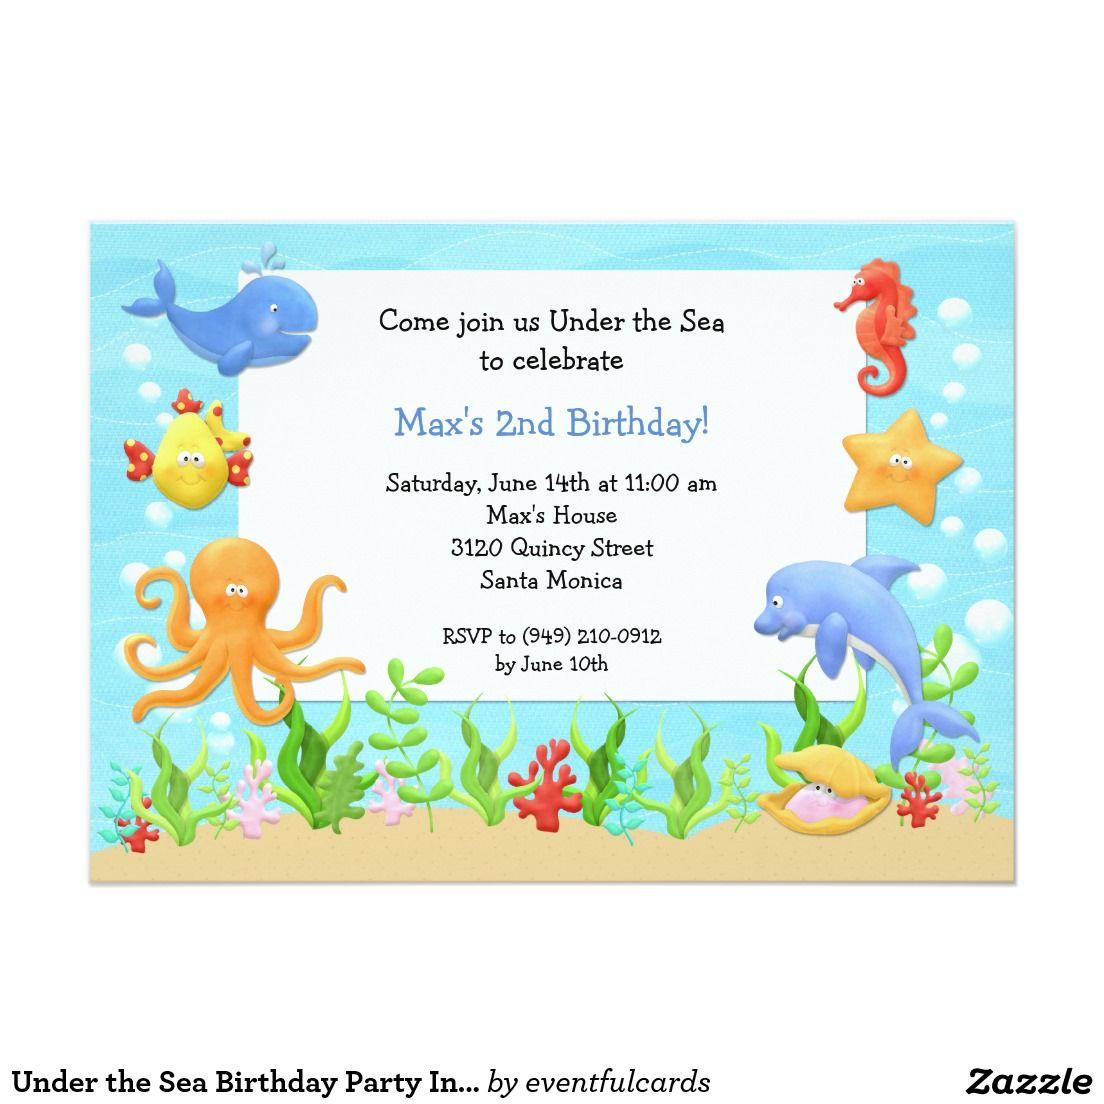 Under the Sea Birthday Party Invitation   Party invitations ...